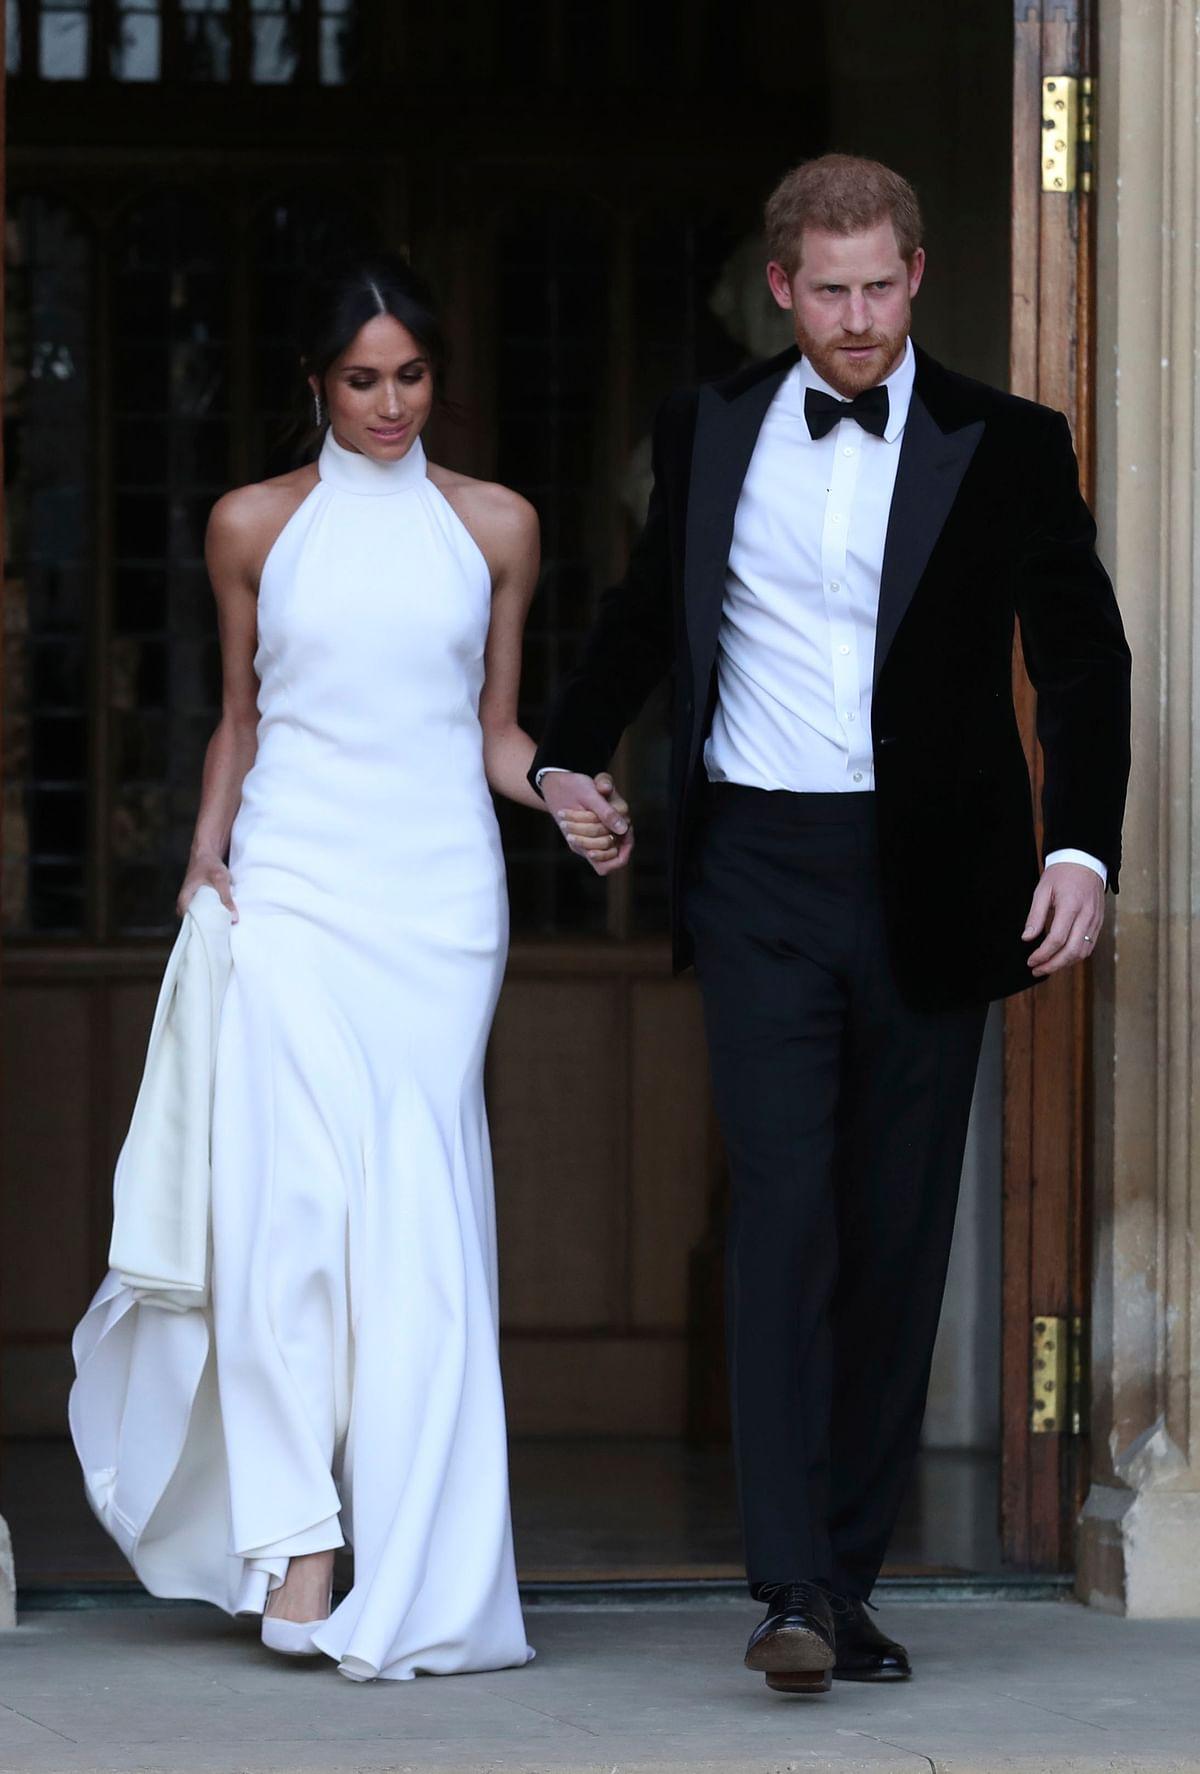 Royal Wedding: Prince Harry and Meghan Markle Now Husband & Wife